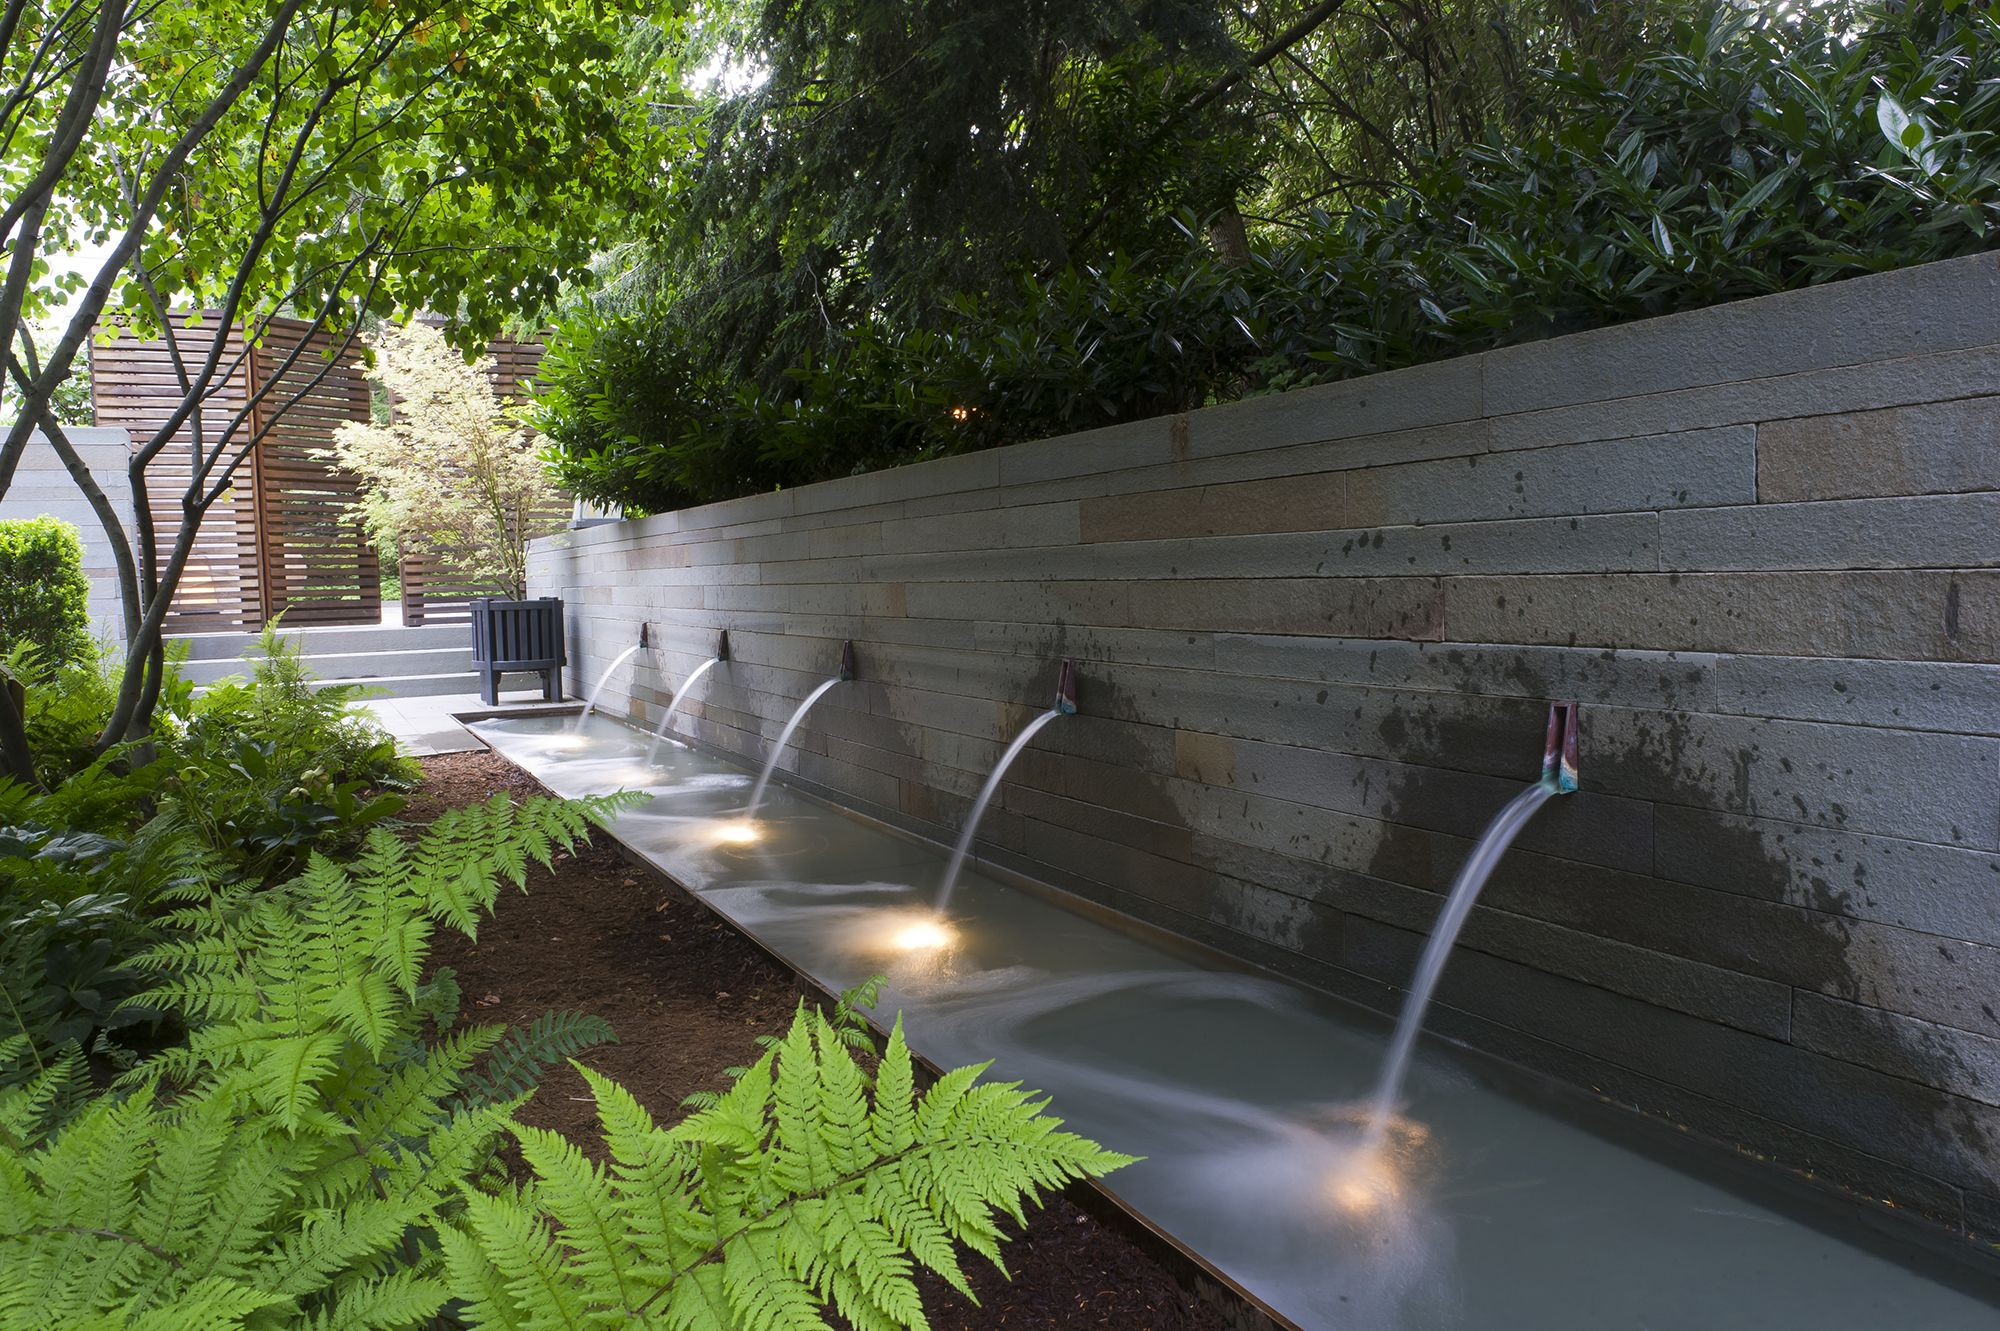 9 Woodland Residence Jpg Water Features In The Garden Outdoor